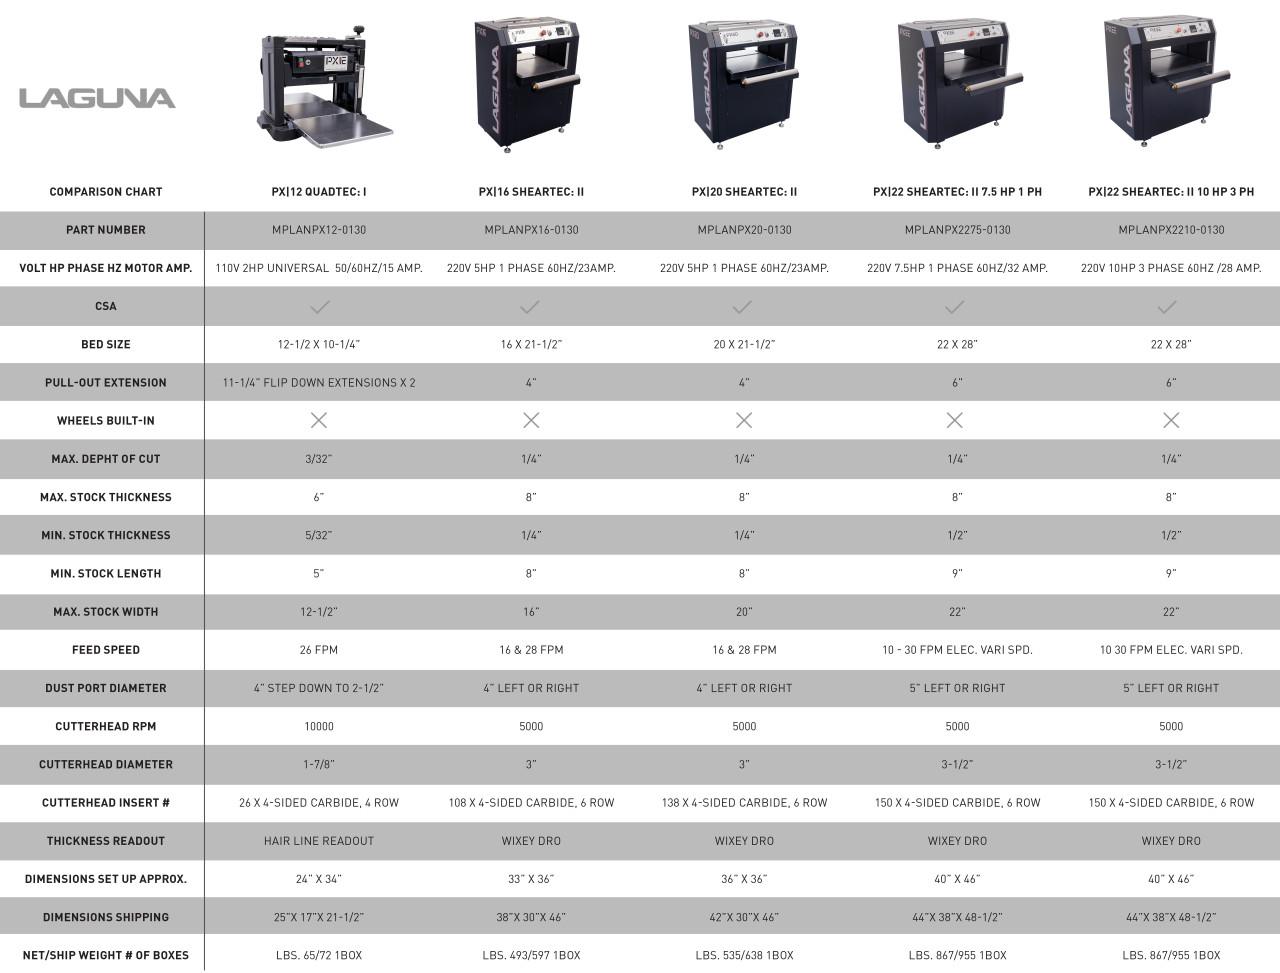 Laguna - PX 22 ShearTec: II Planer - 7.5hp; 220v, 32 Amps, 1 Phase (MPLANPX2275013)